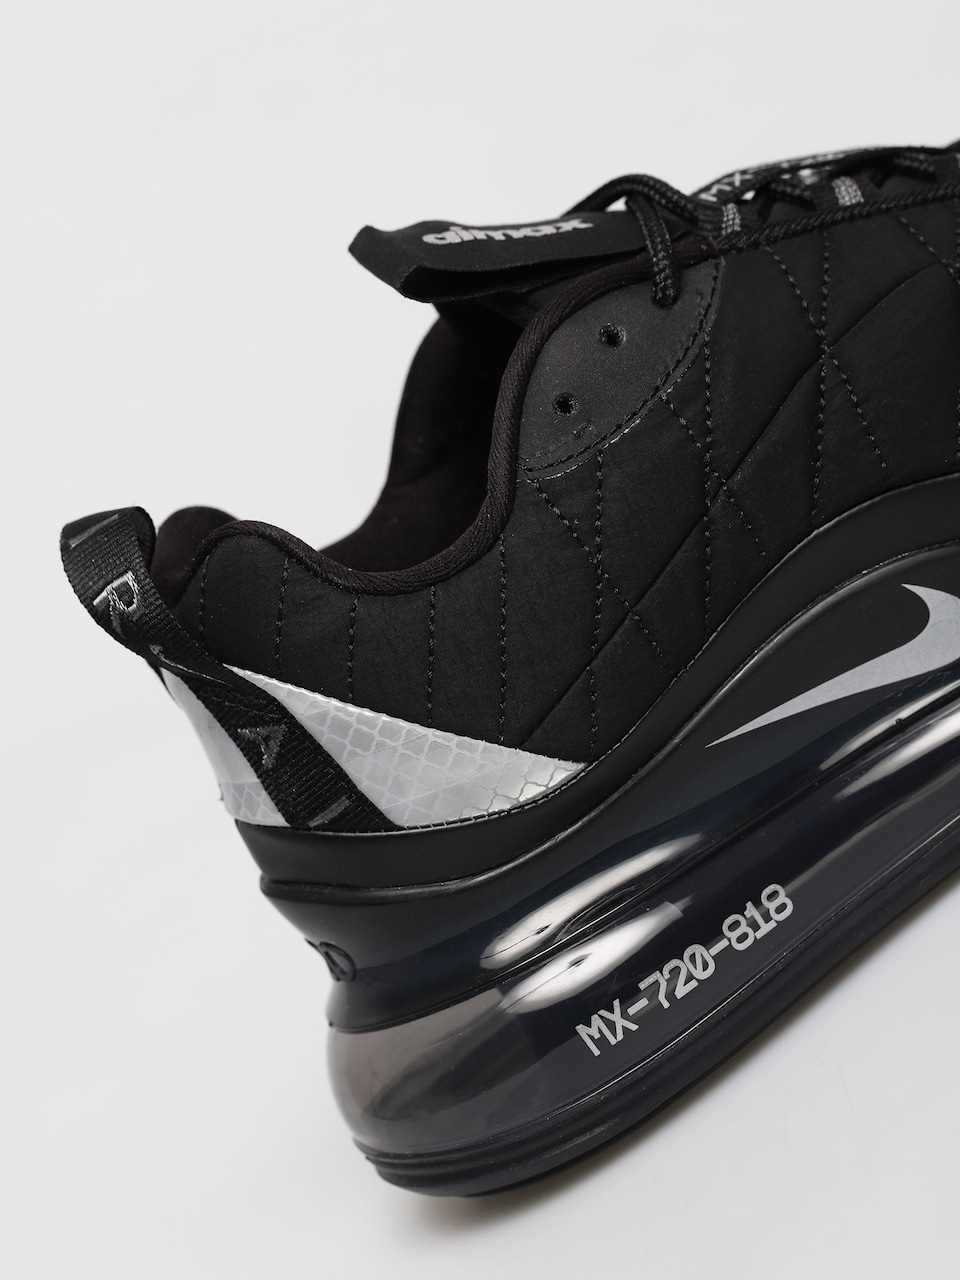 Buty Nike Mx 720 818 Wmn (blackmetallic silver black anthracite)